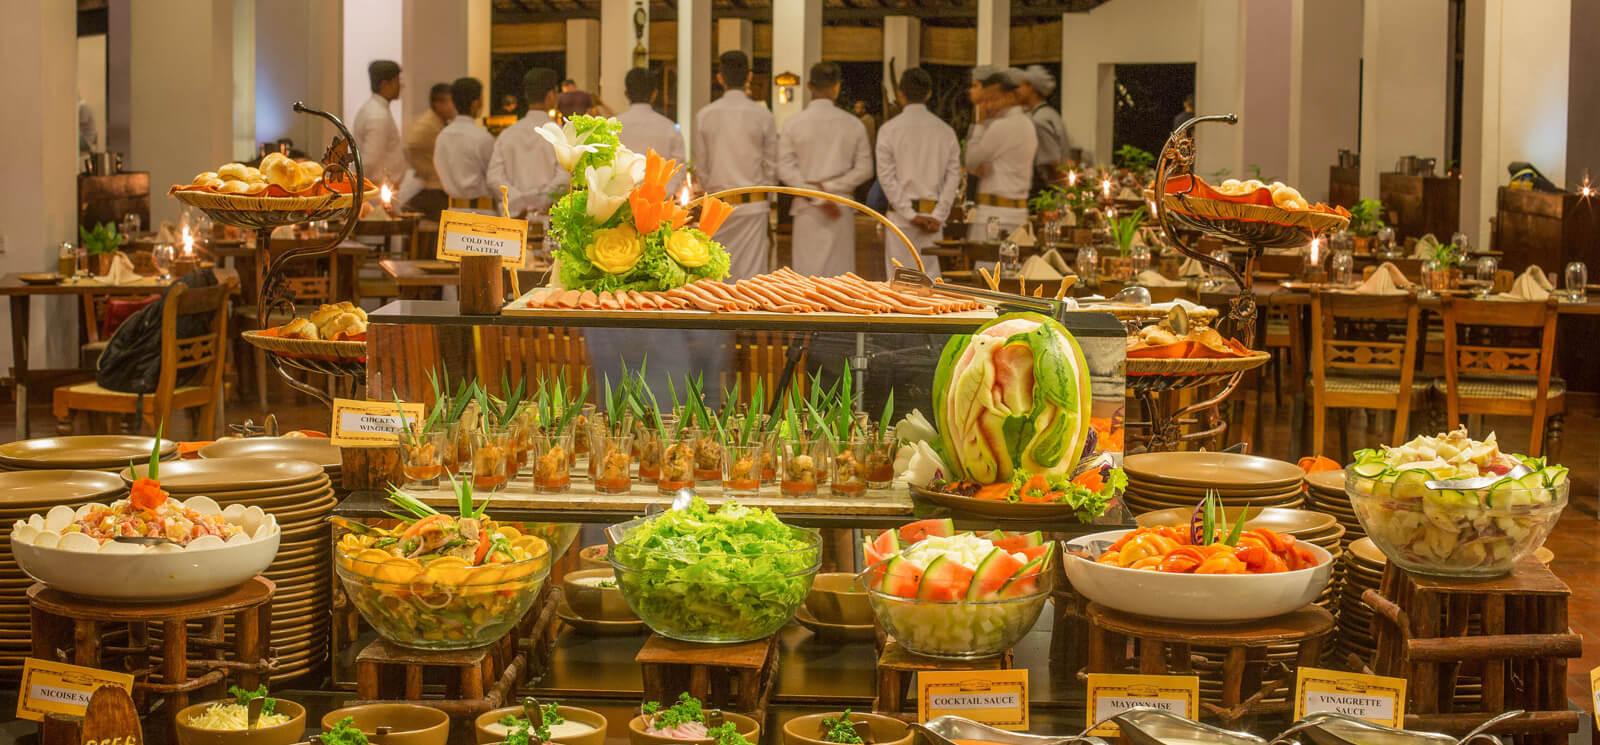 Experience the heritage and adventure at Sigiriya